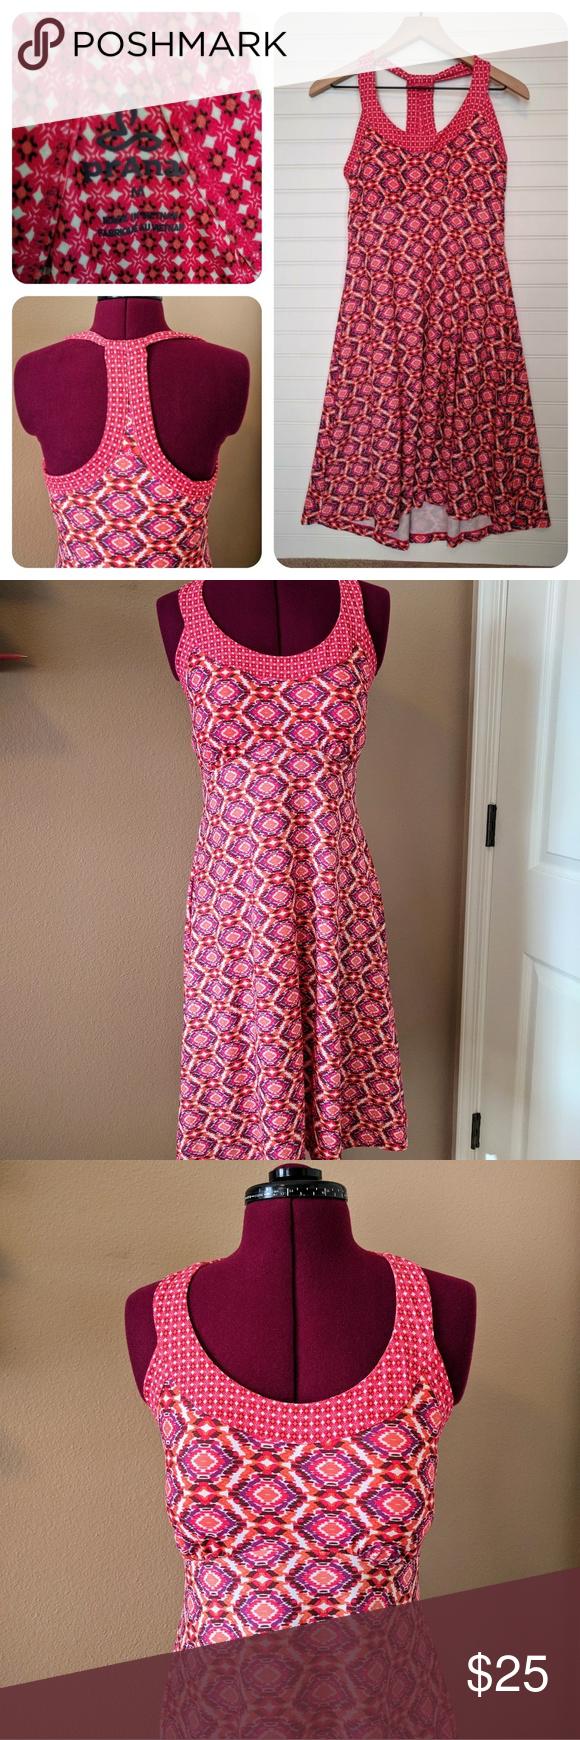 Prana Cali Dress With Built In Bra Clothes Design Dresses Women Shopping [ 1740 x 580 Pixel ]